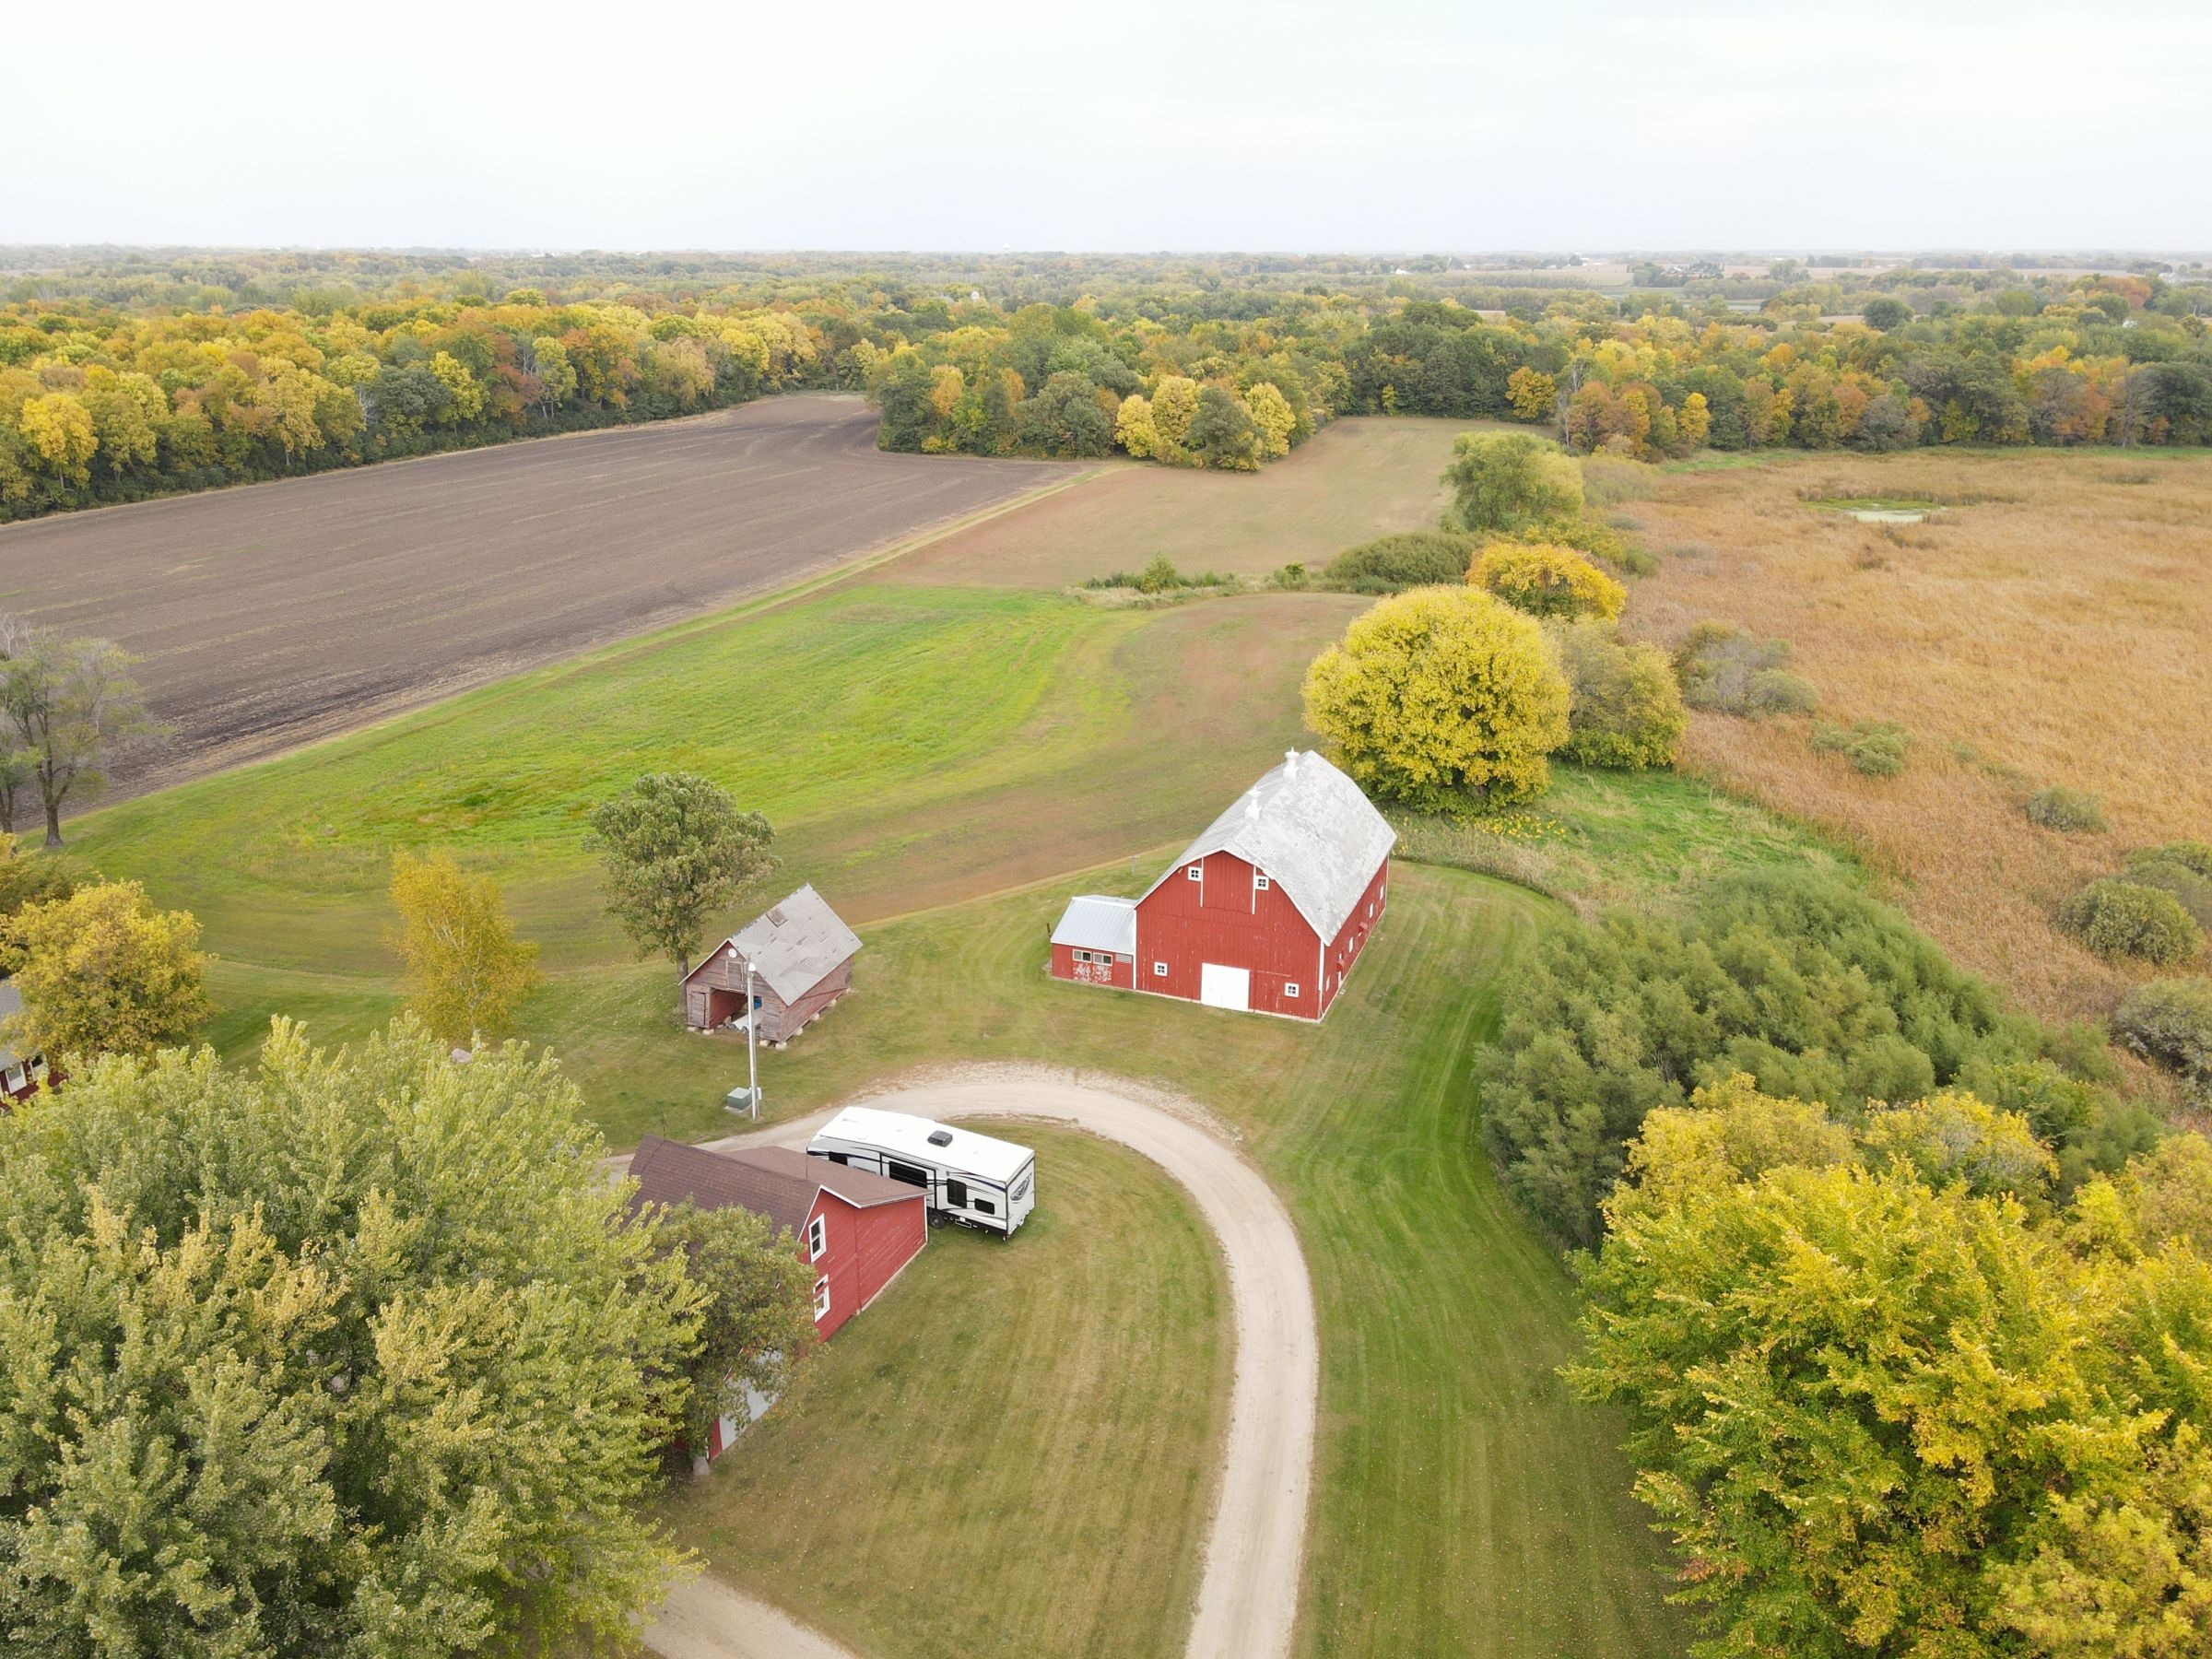 residential-land-mcleod-county-minnesota-80-acres-listing-number-15182-3-2020-10-07-142931.JPG